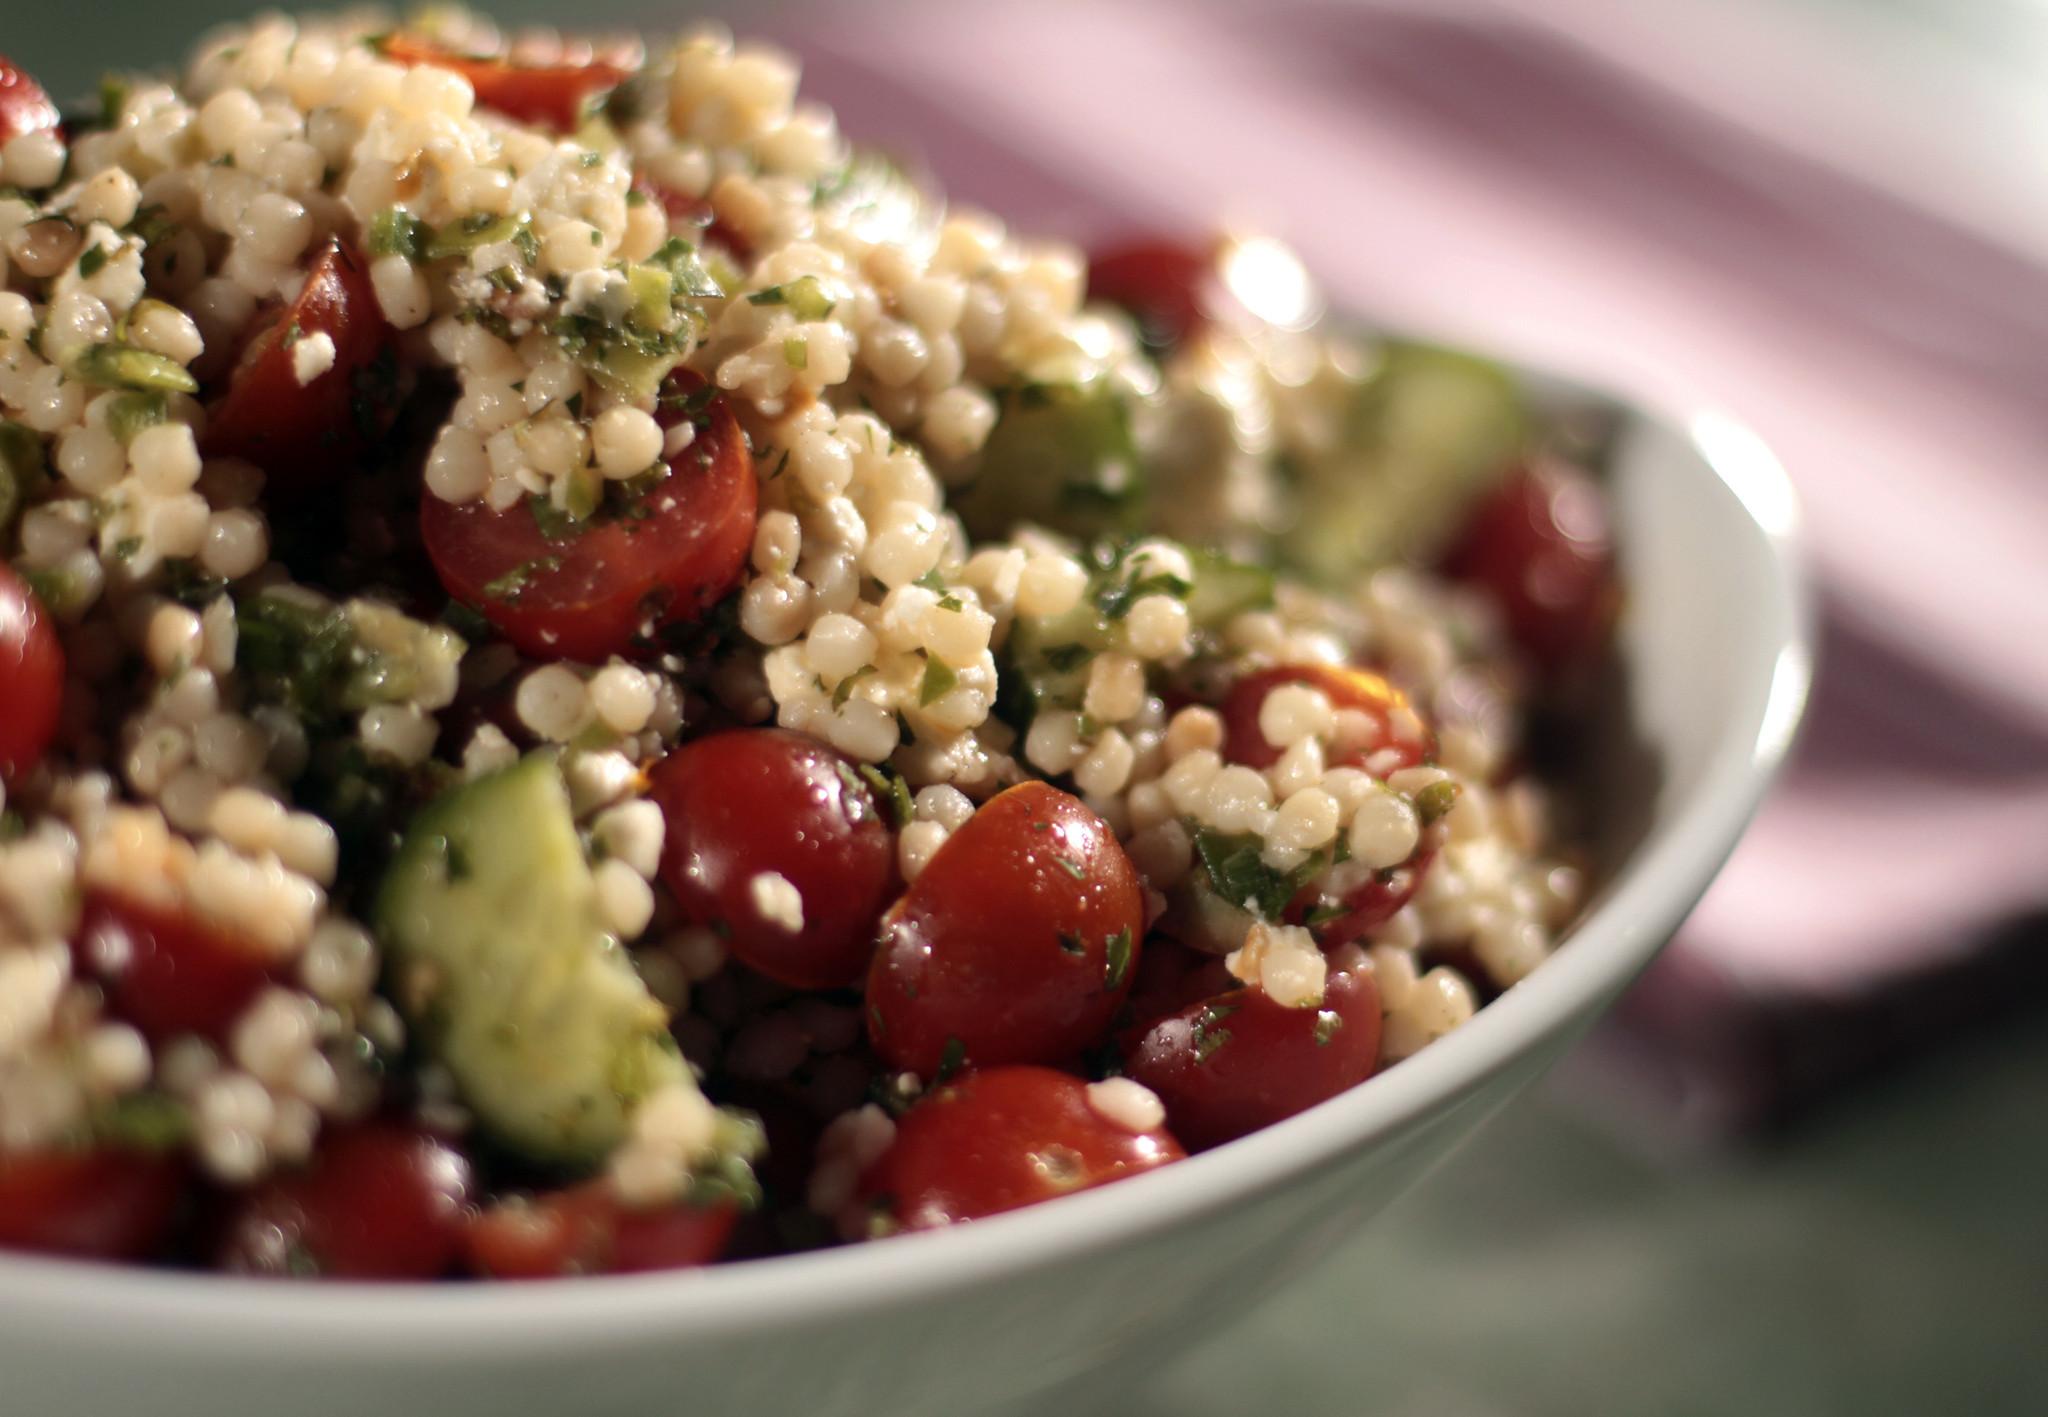 Grain salad convert sings the praises of quinoa, farro and couscous ...